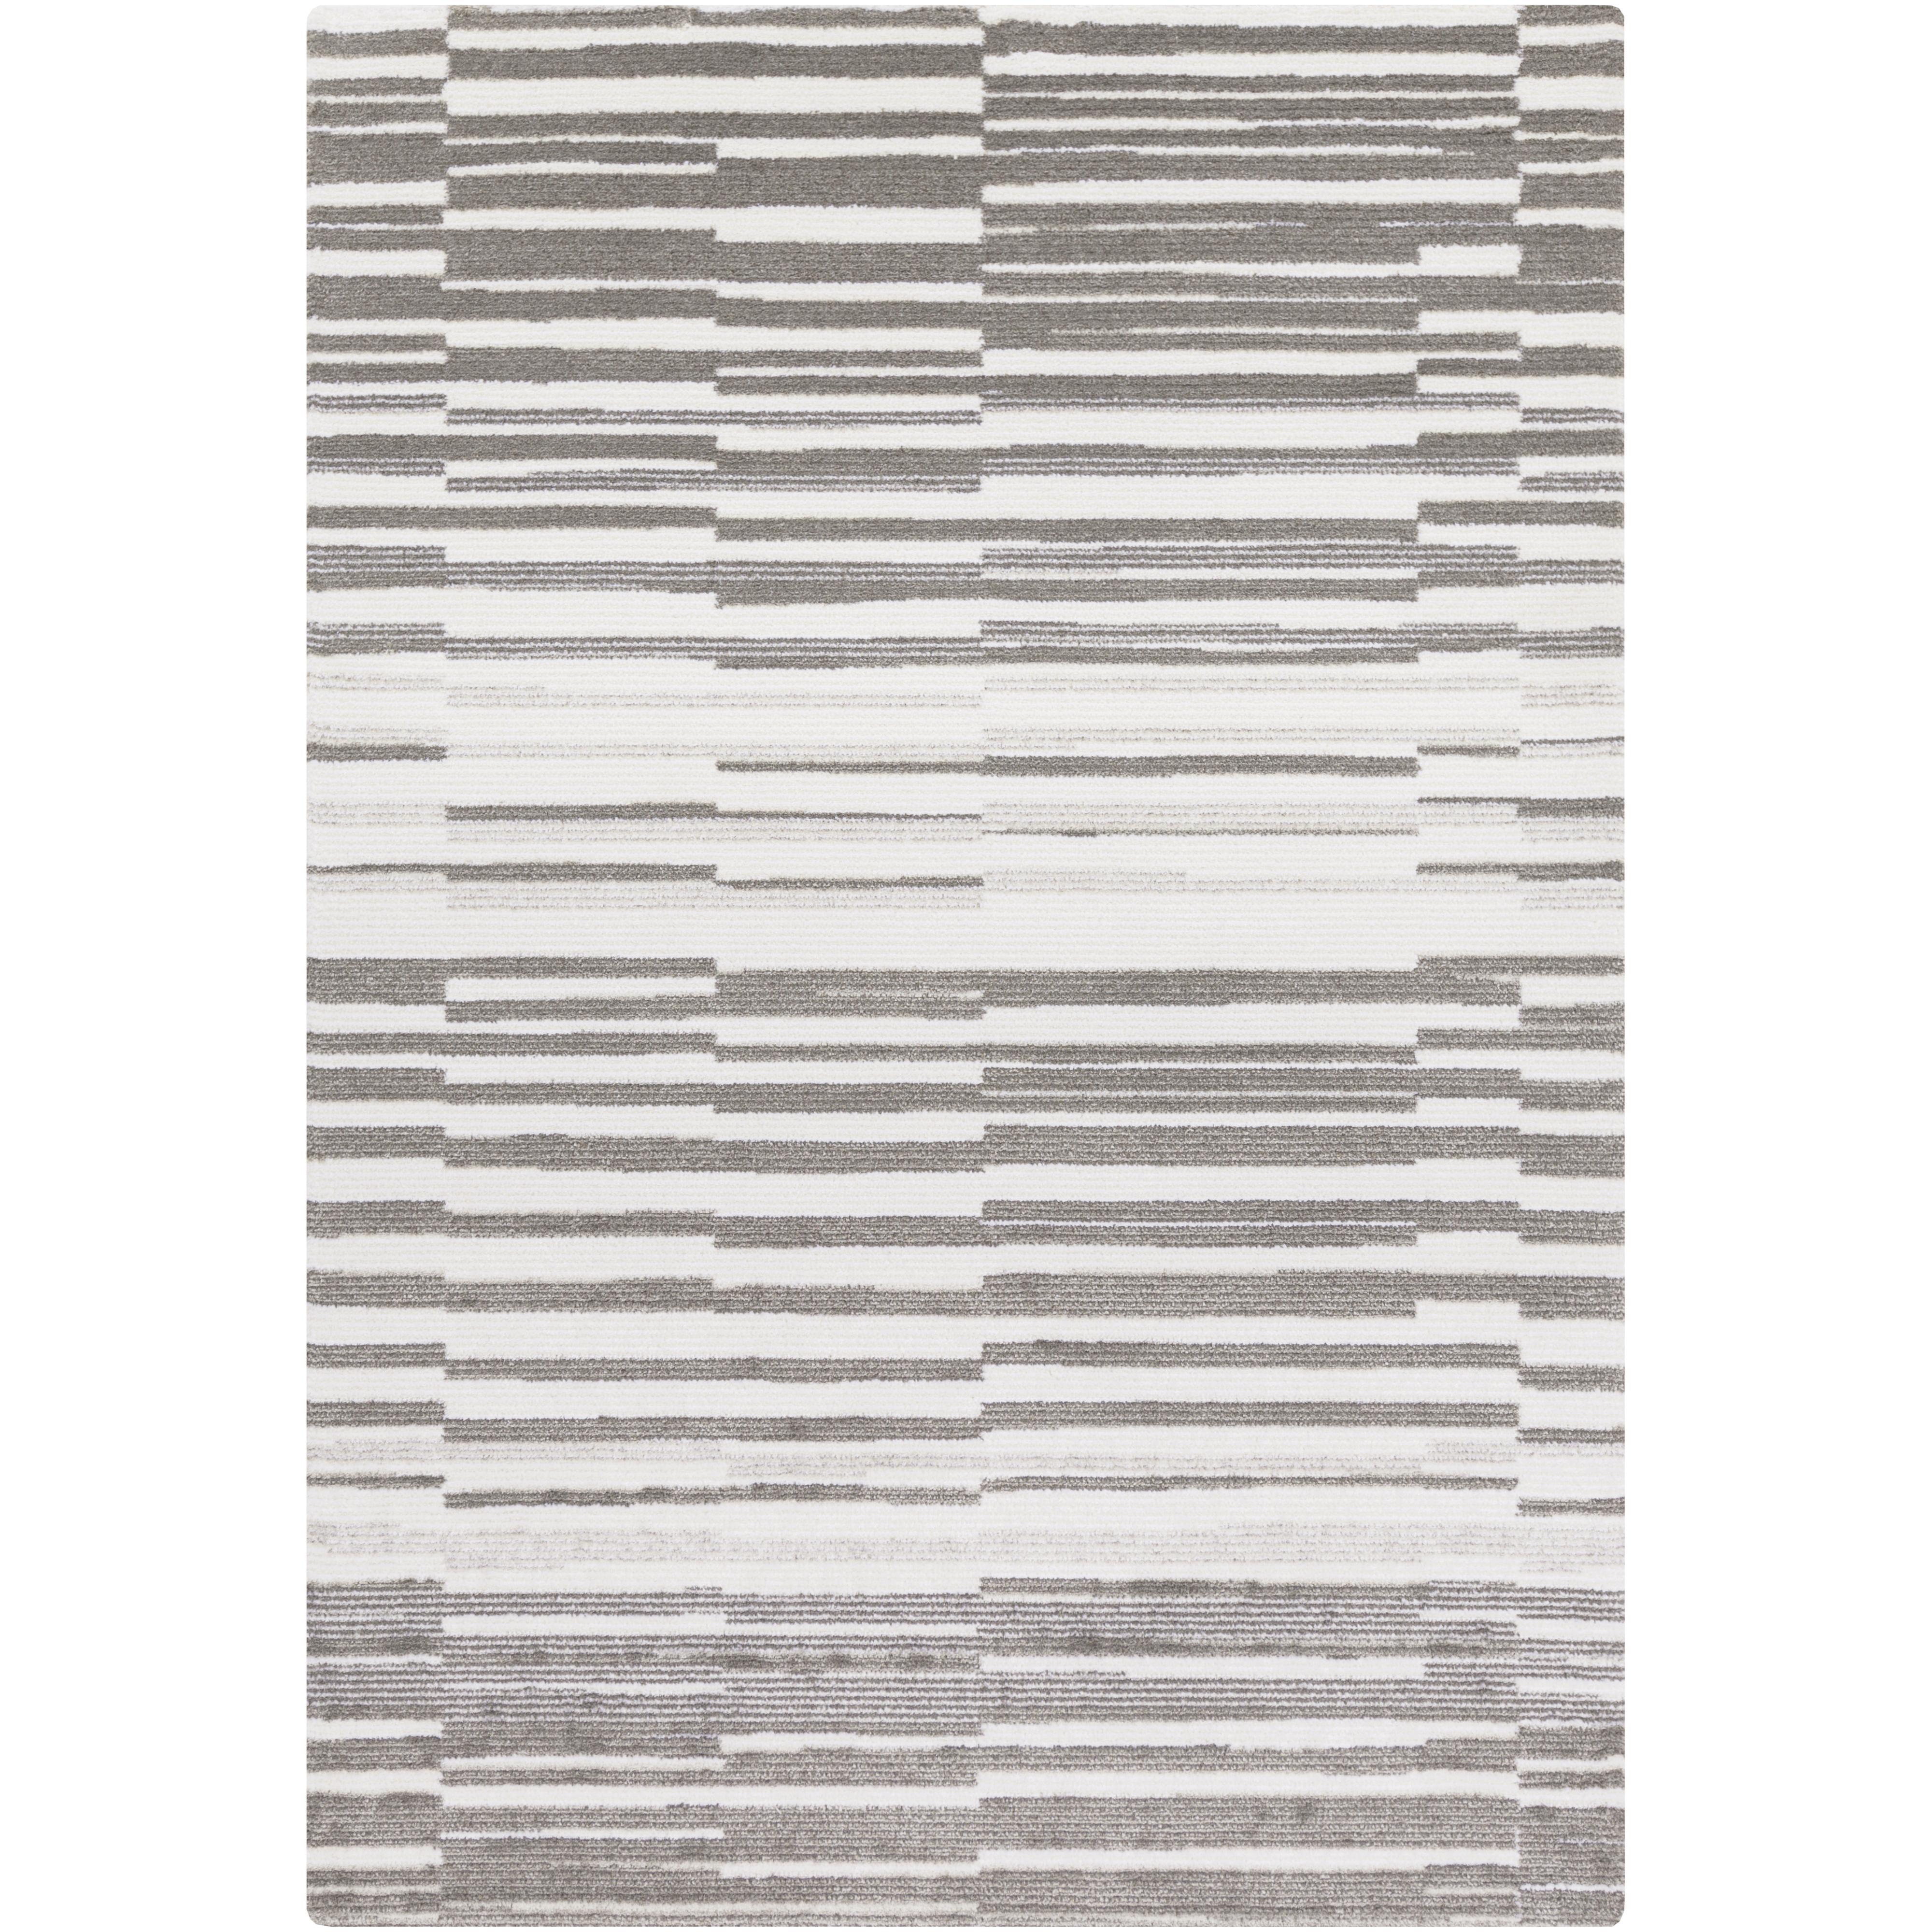 Surya Rugs Perla 9' x 12' - Item Number: PRA6005-912